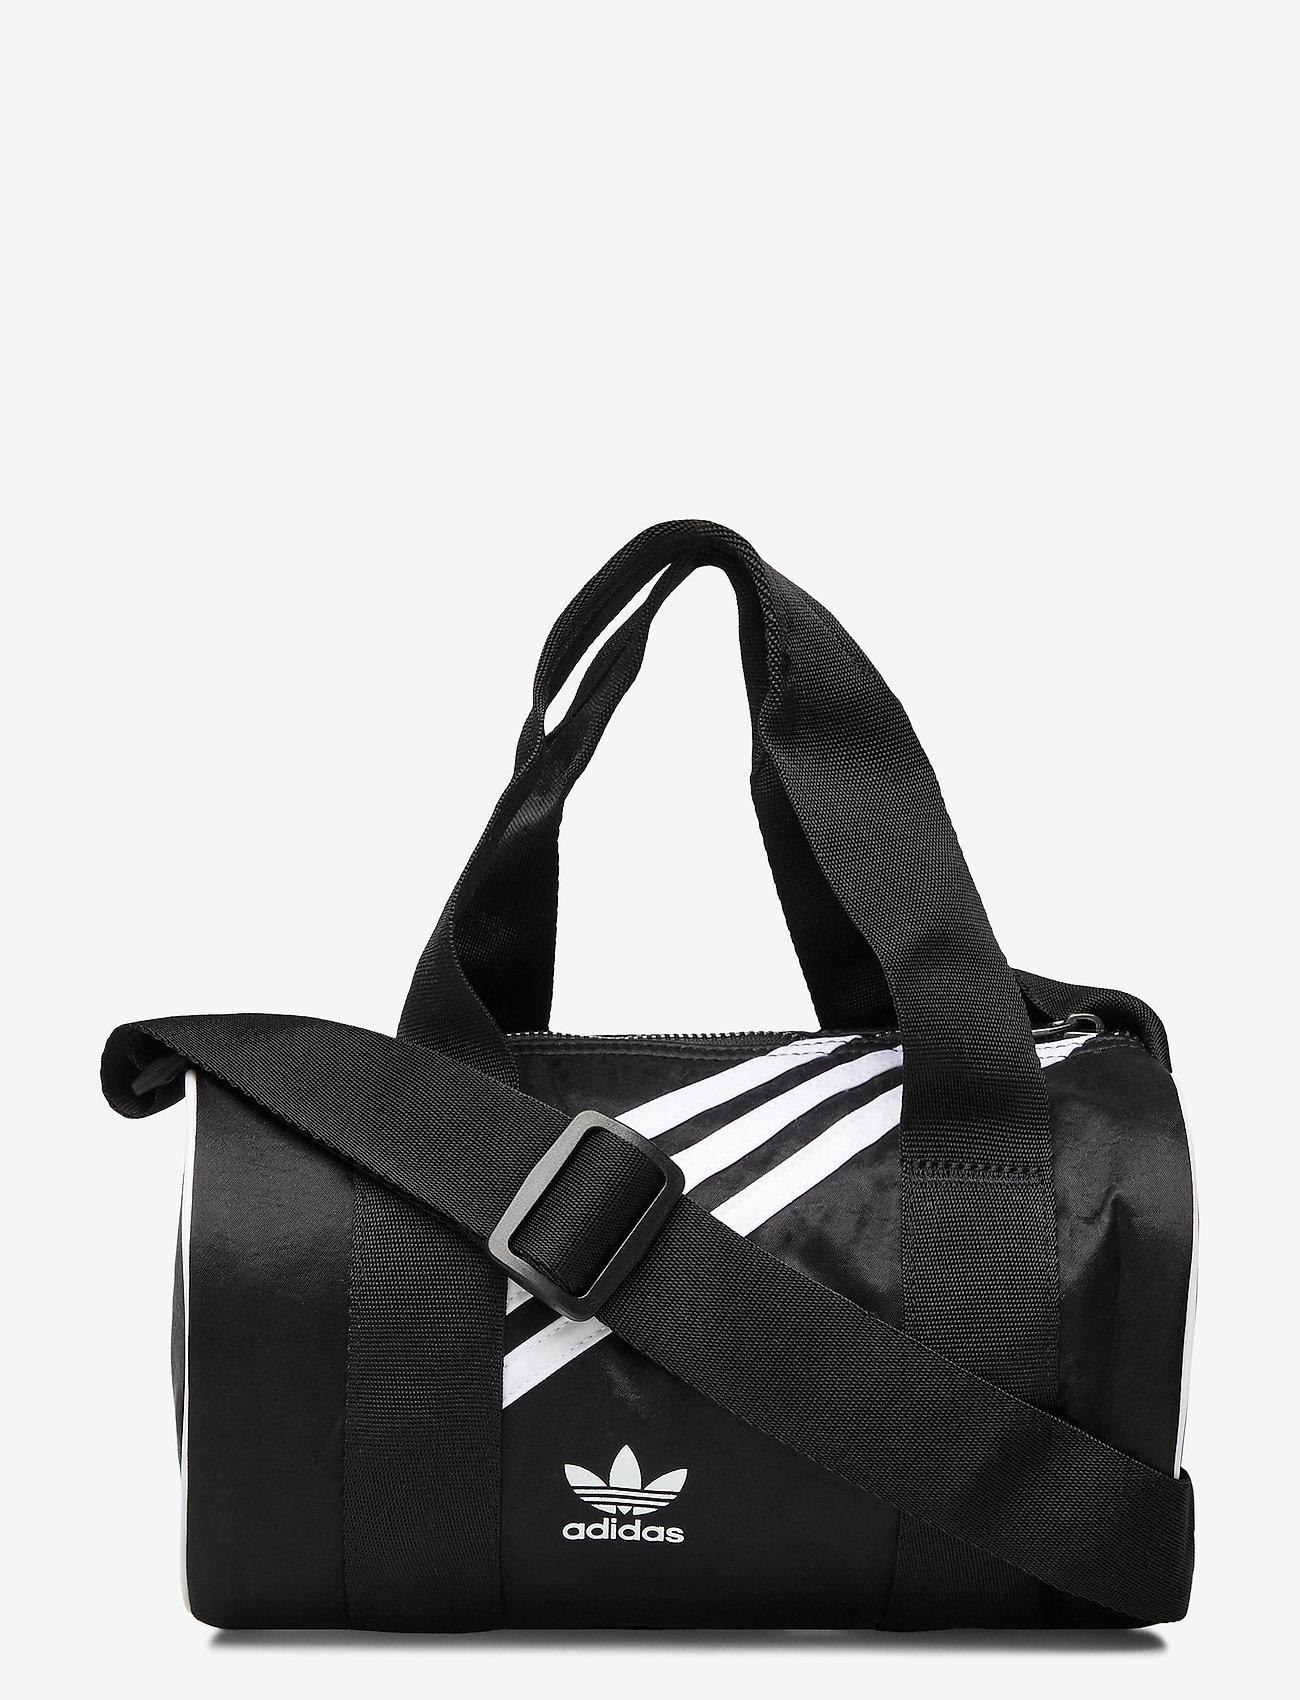 adidas Originals - MINI D NYLON - gymtassen - black - 0